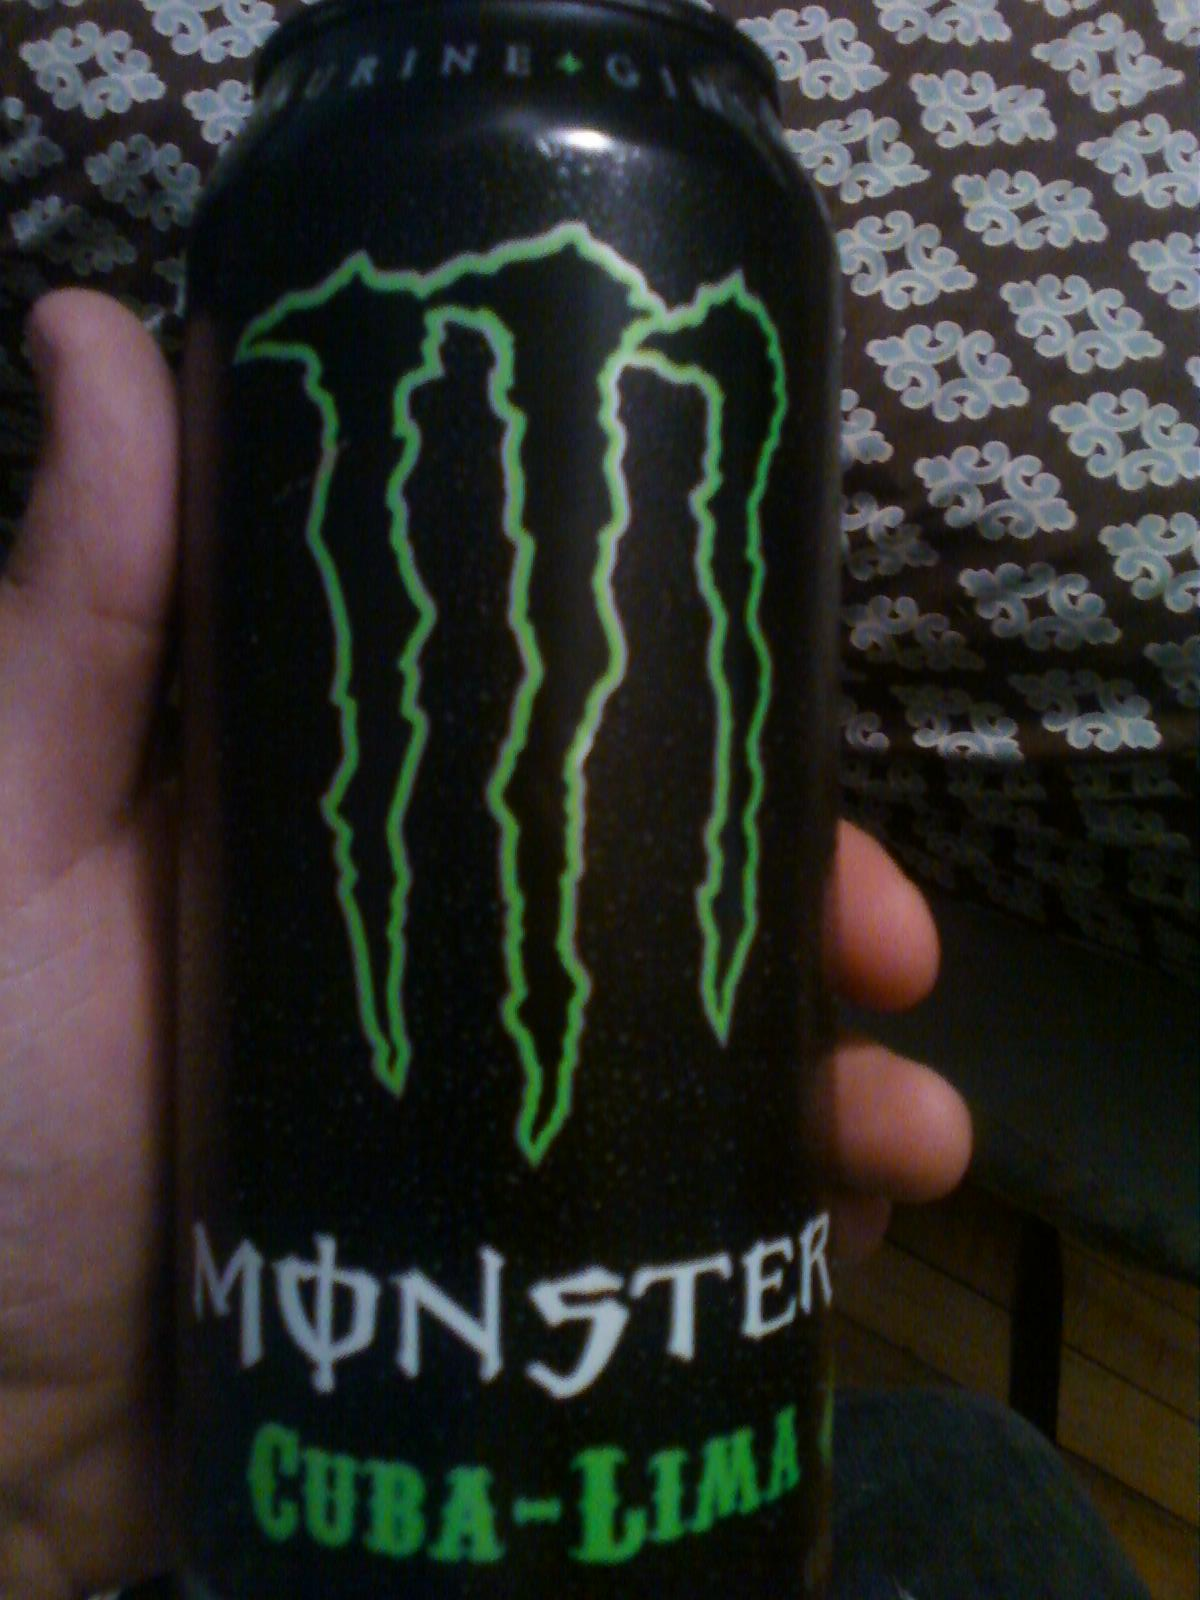 Energy Drink Heaven Monster Cuba Lime